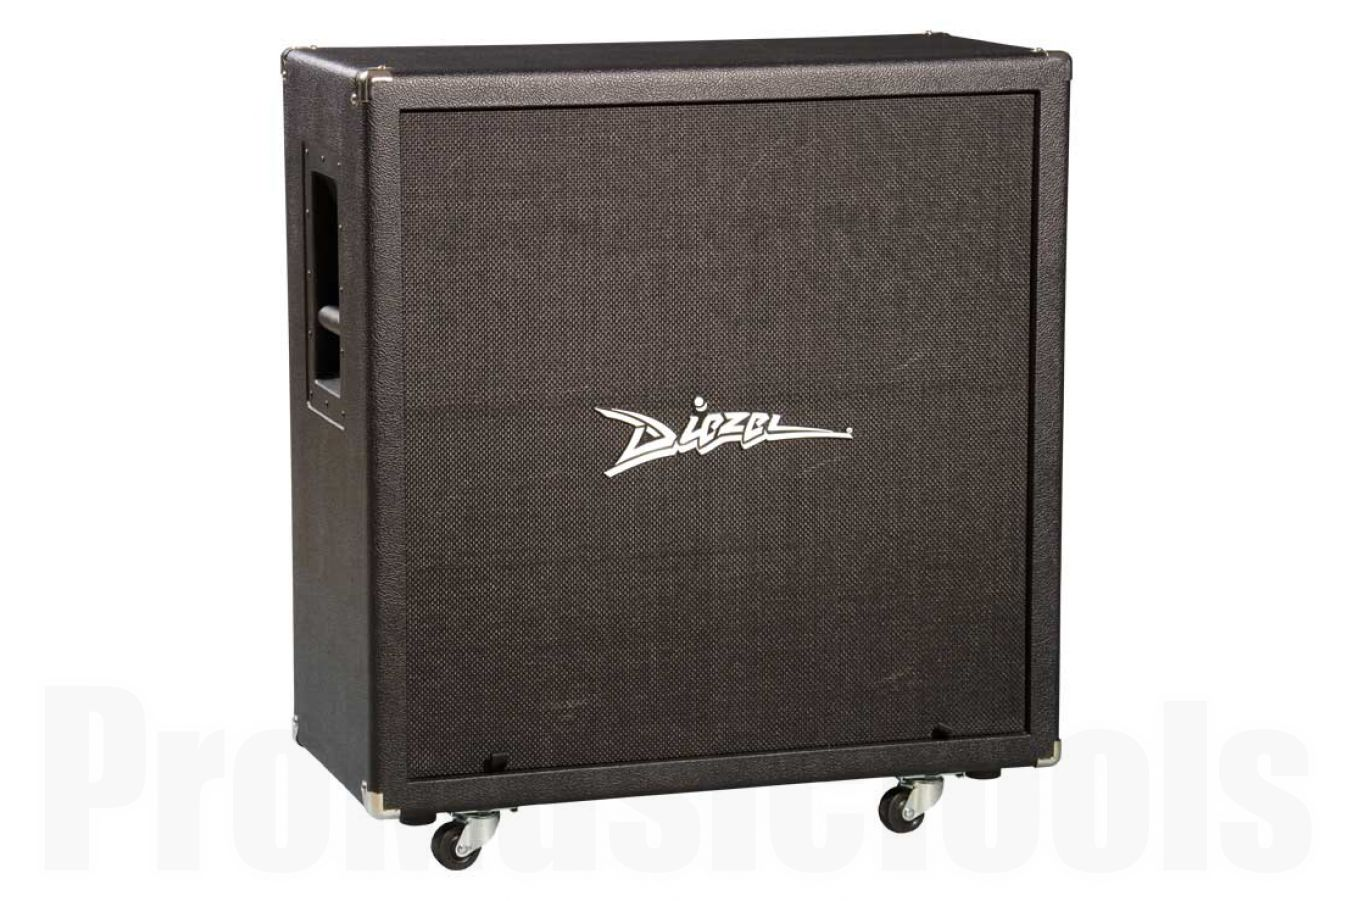 Diezel V412R Box - 4x12 Celestion Vintage 30 rear-loaded